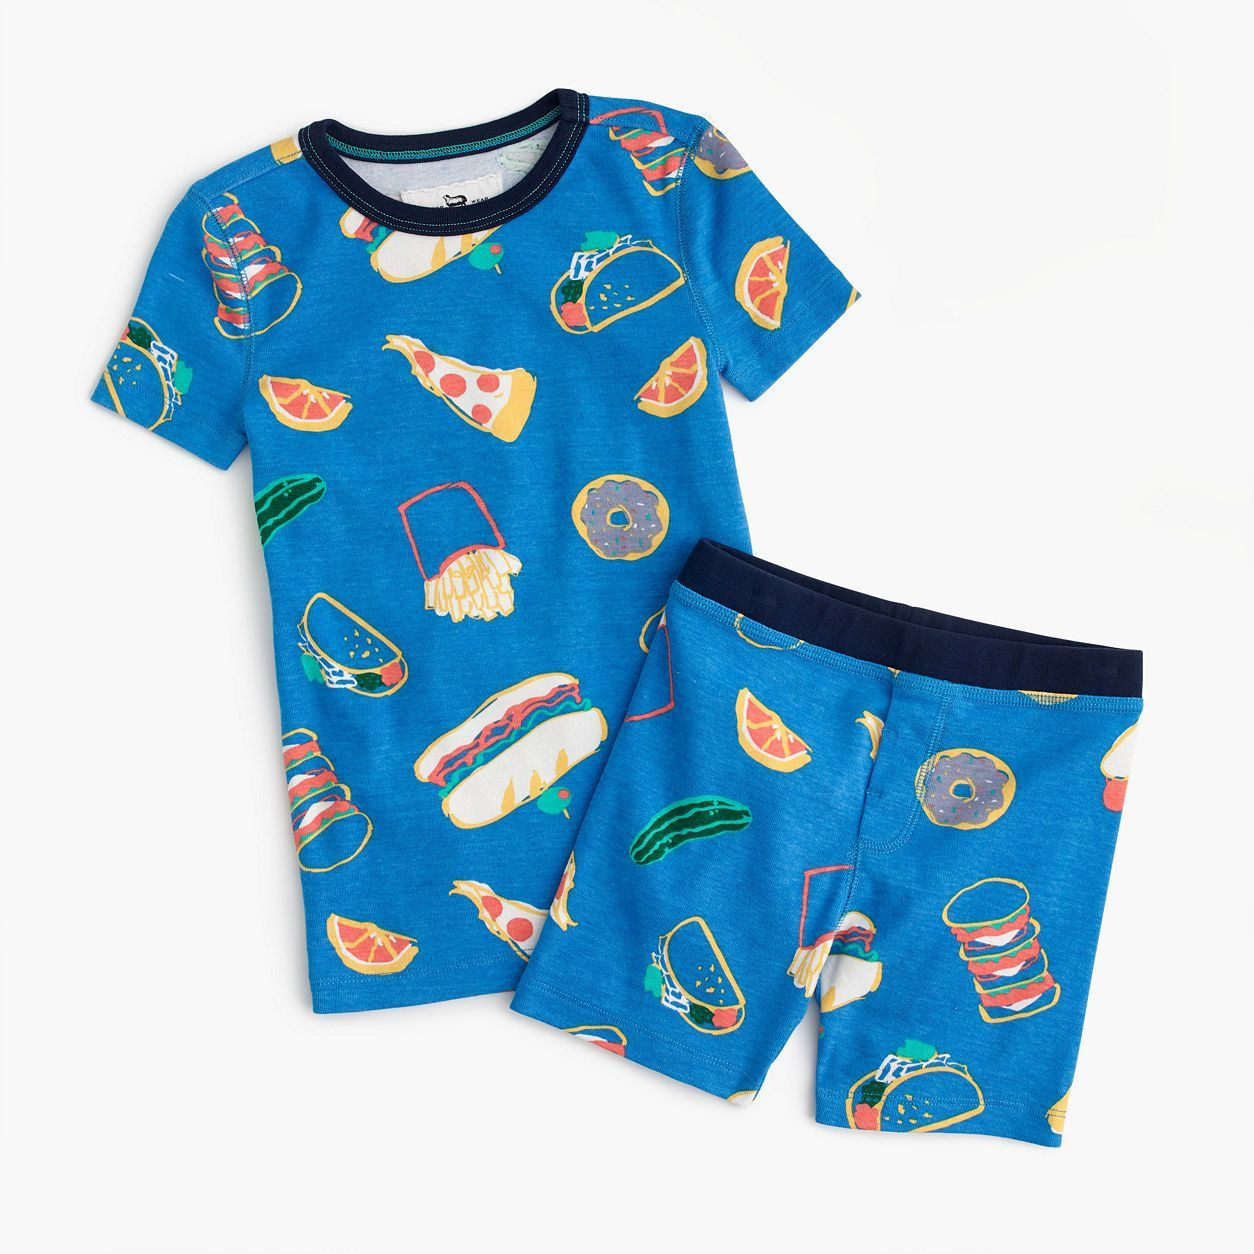 680b9ac80b1 crewcuts Girls Short Pajama Set In Pizza Party (Size 14 Kid ...